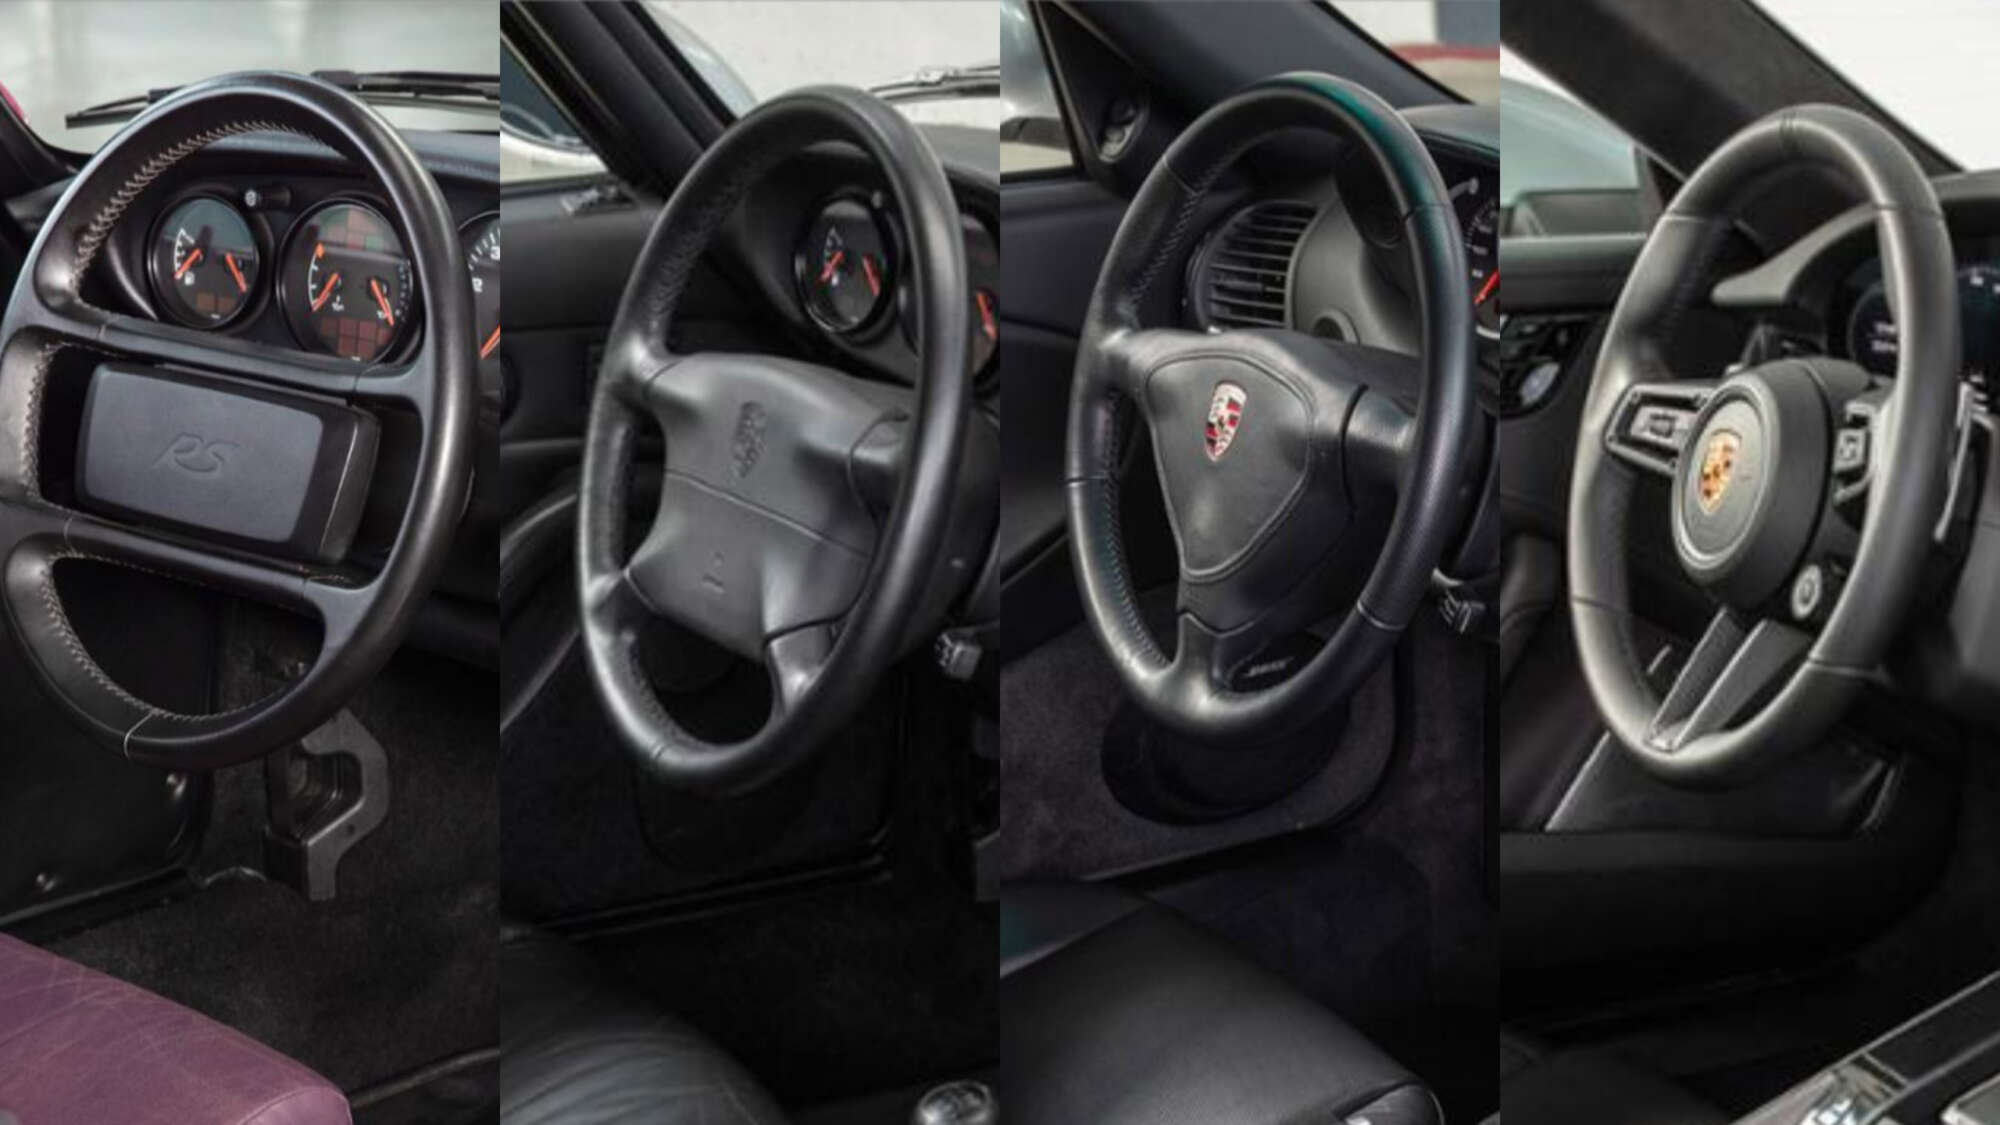 The generations of the 911 Porsche steering wheel